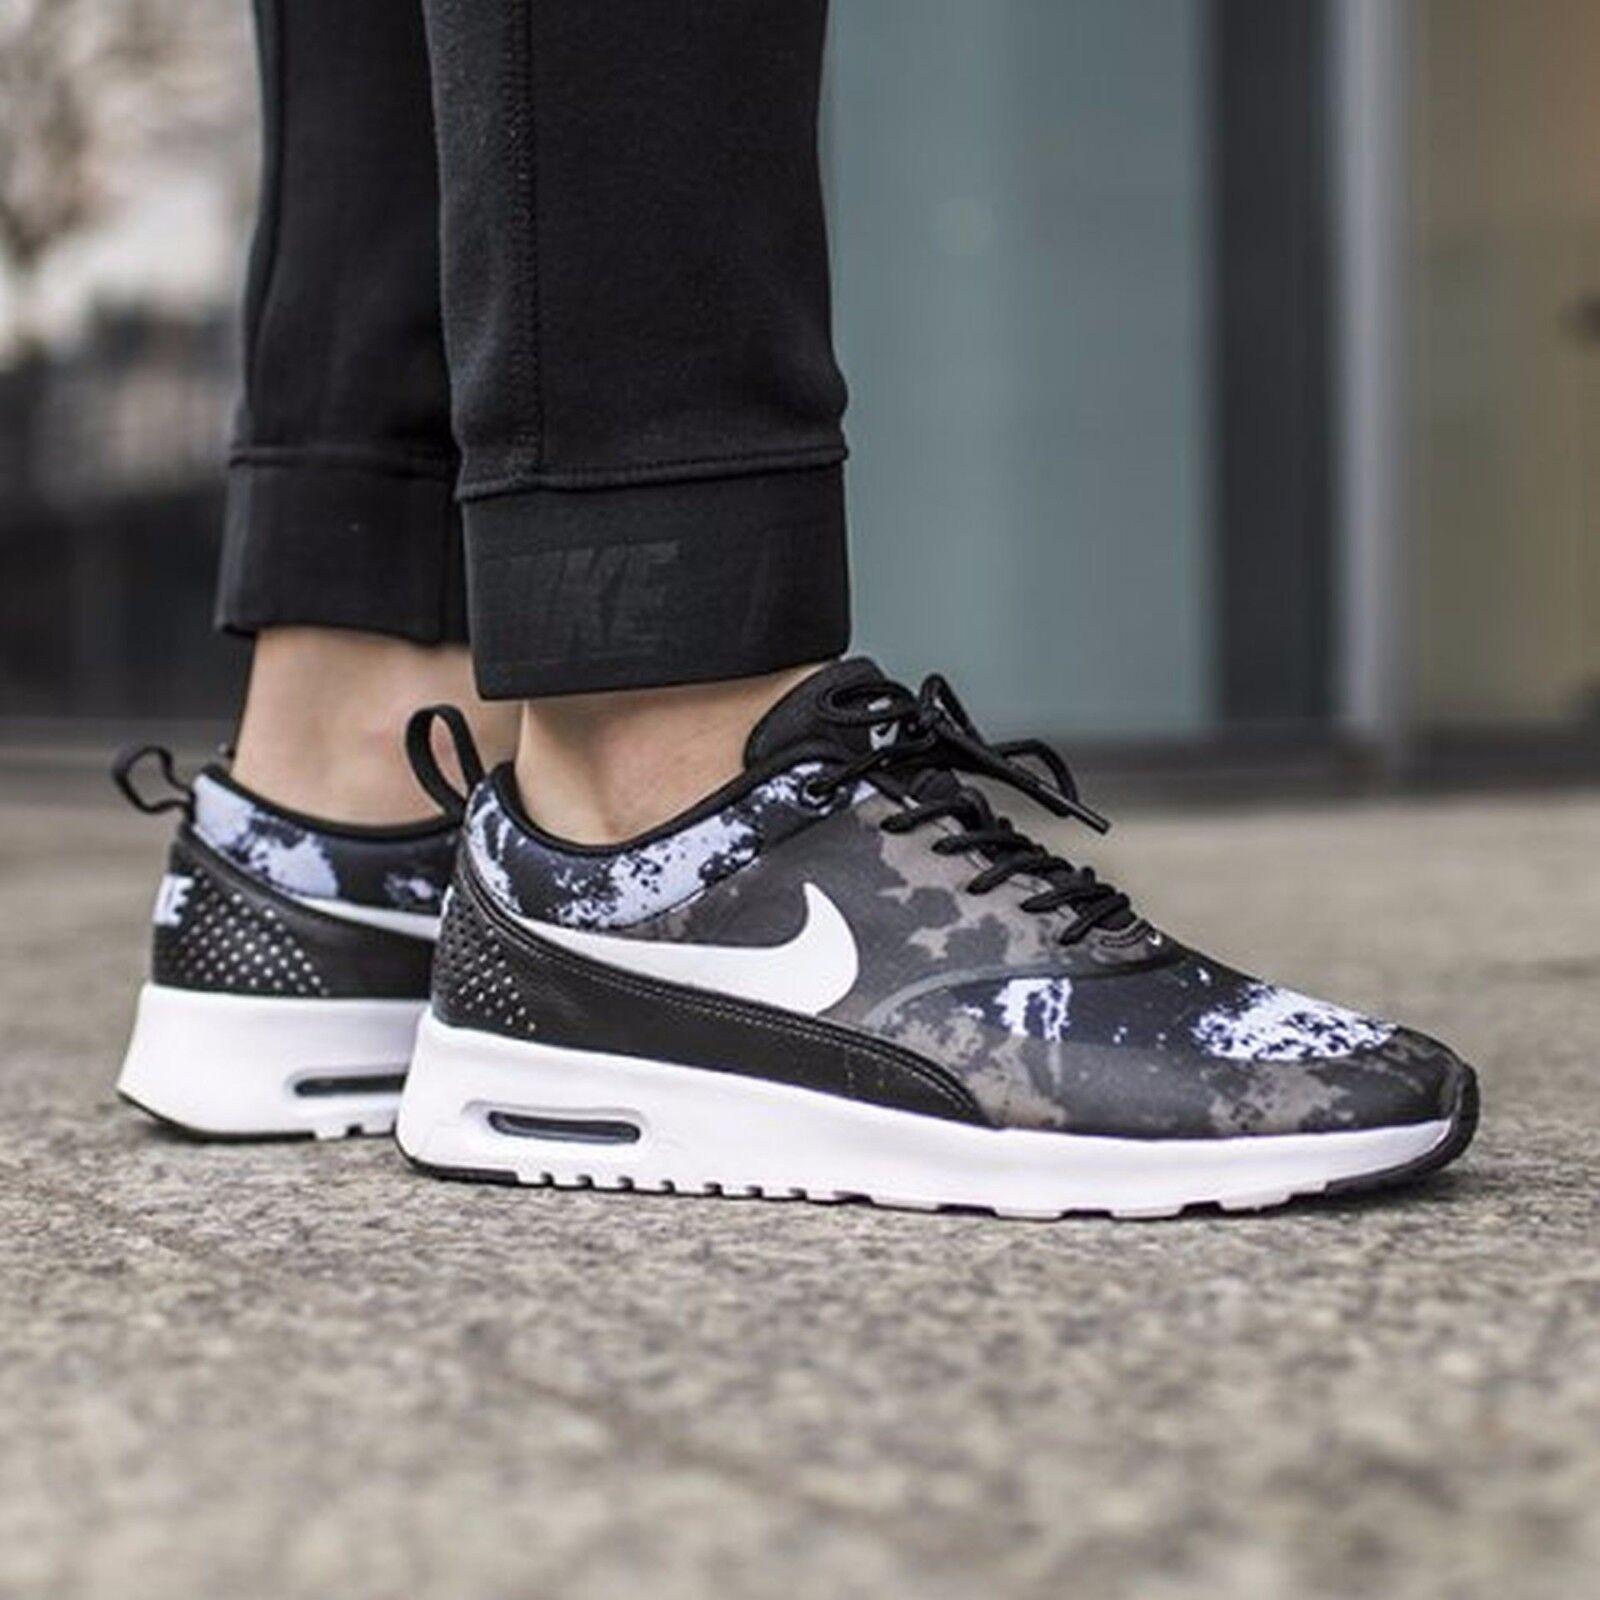 Nike Air Max Thea Print  Womens Size 7 599408-007 Black White-Dark Grey